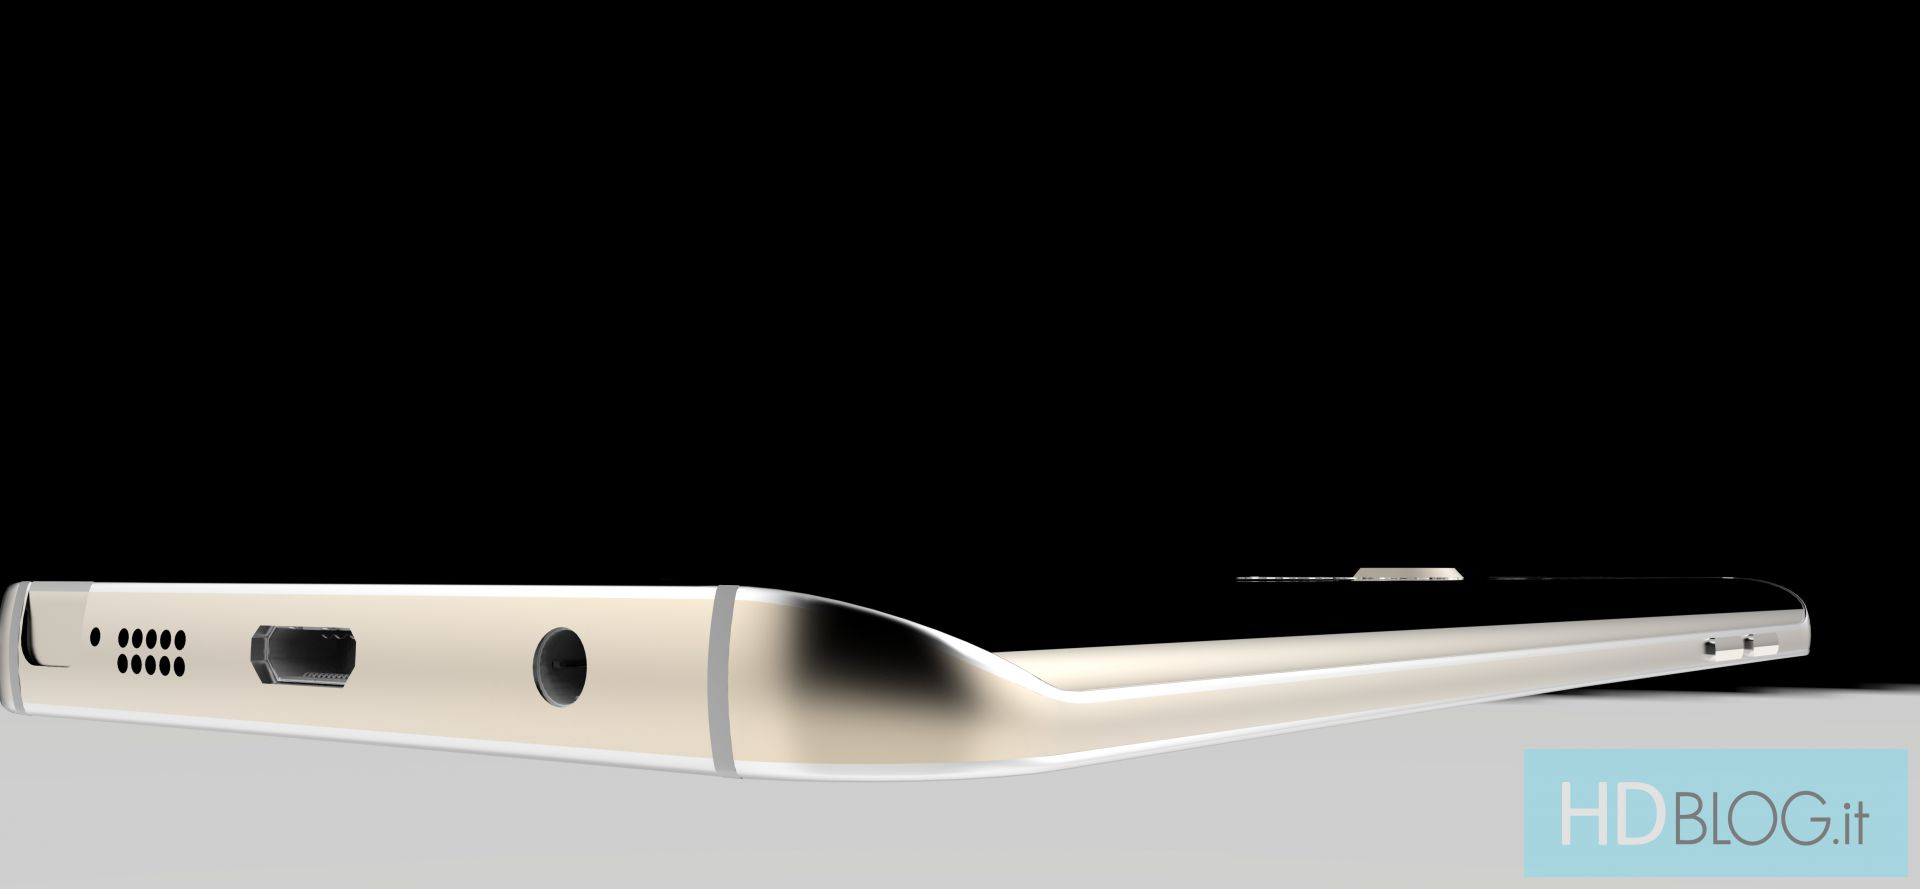 Galaxy-Note-5-schematics-and-concept-renders-16.jpg